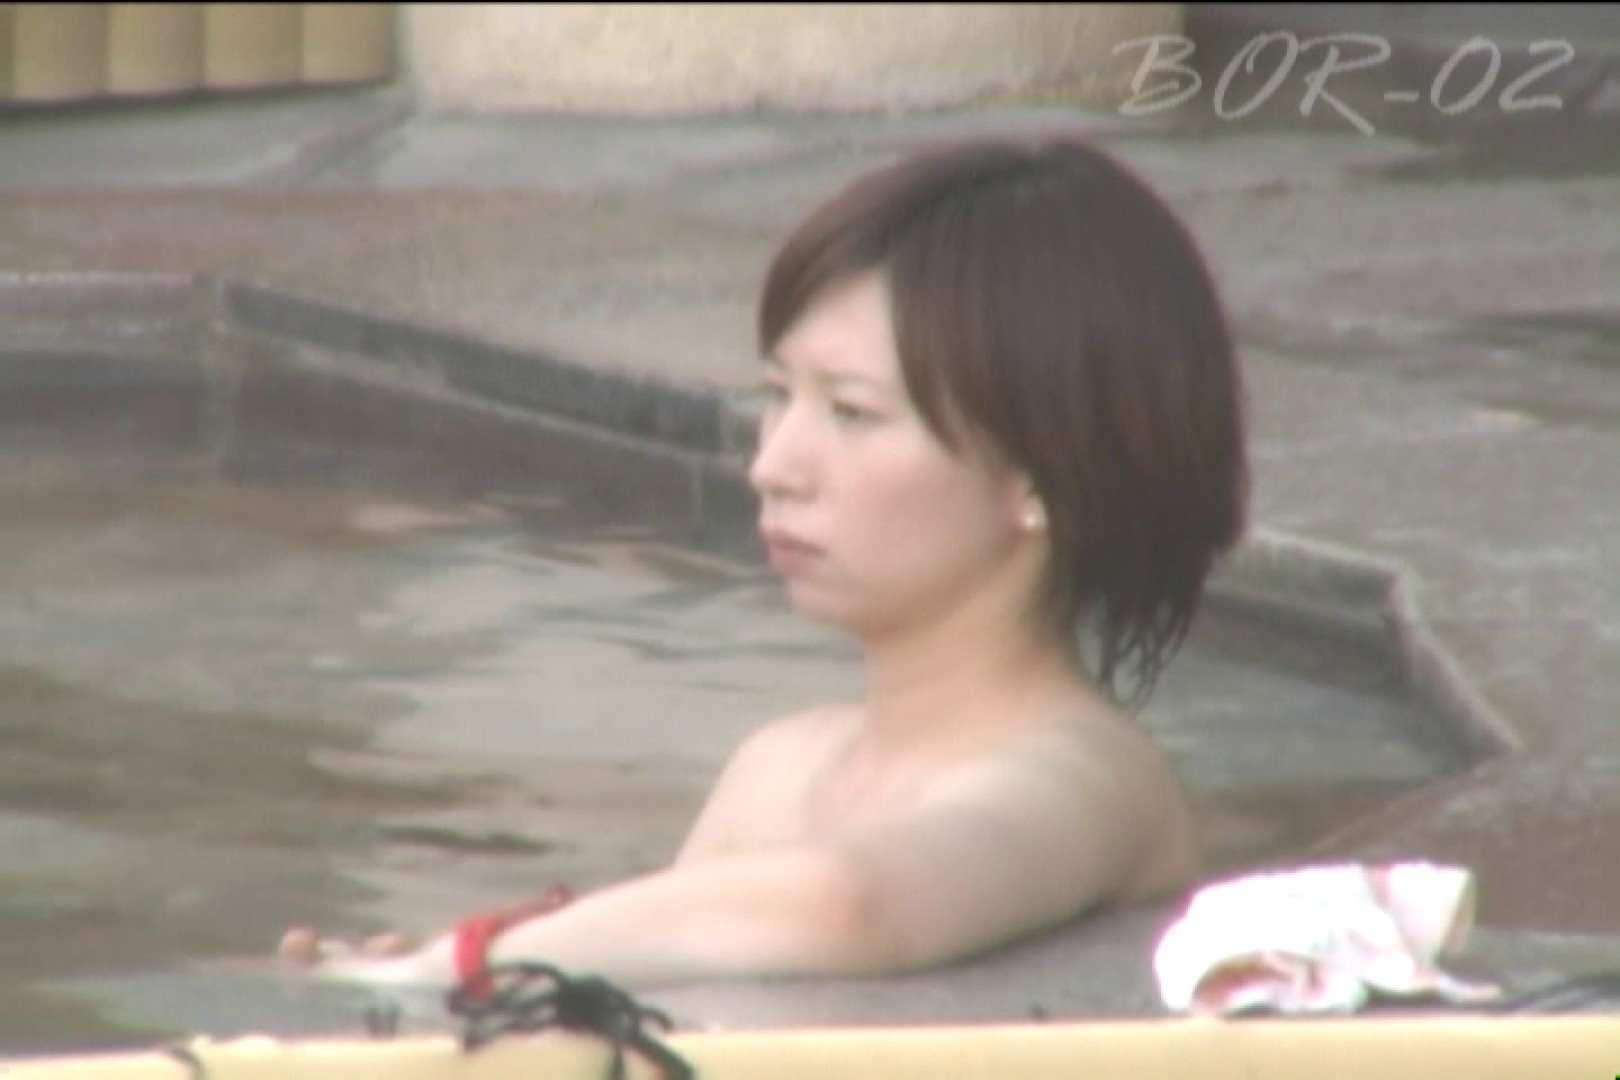 Aquaな露天風呂Vol.476 露天 | OLセックス  80画像 1